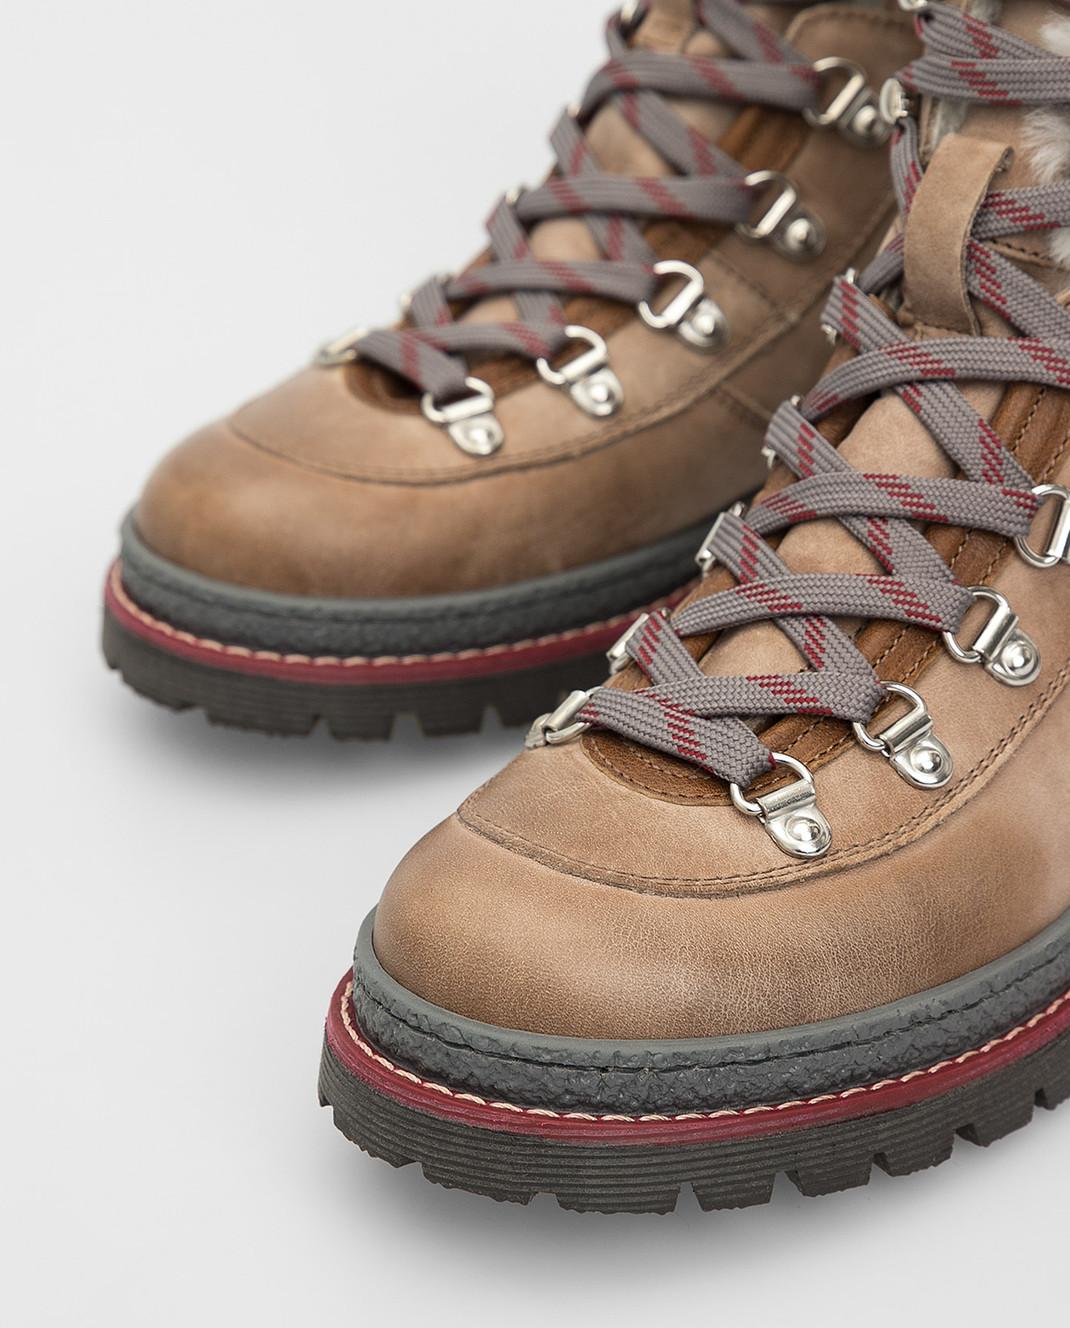 Brunello Cucinelli Детские бежевые кожаные ботинки изображение 4